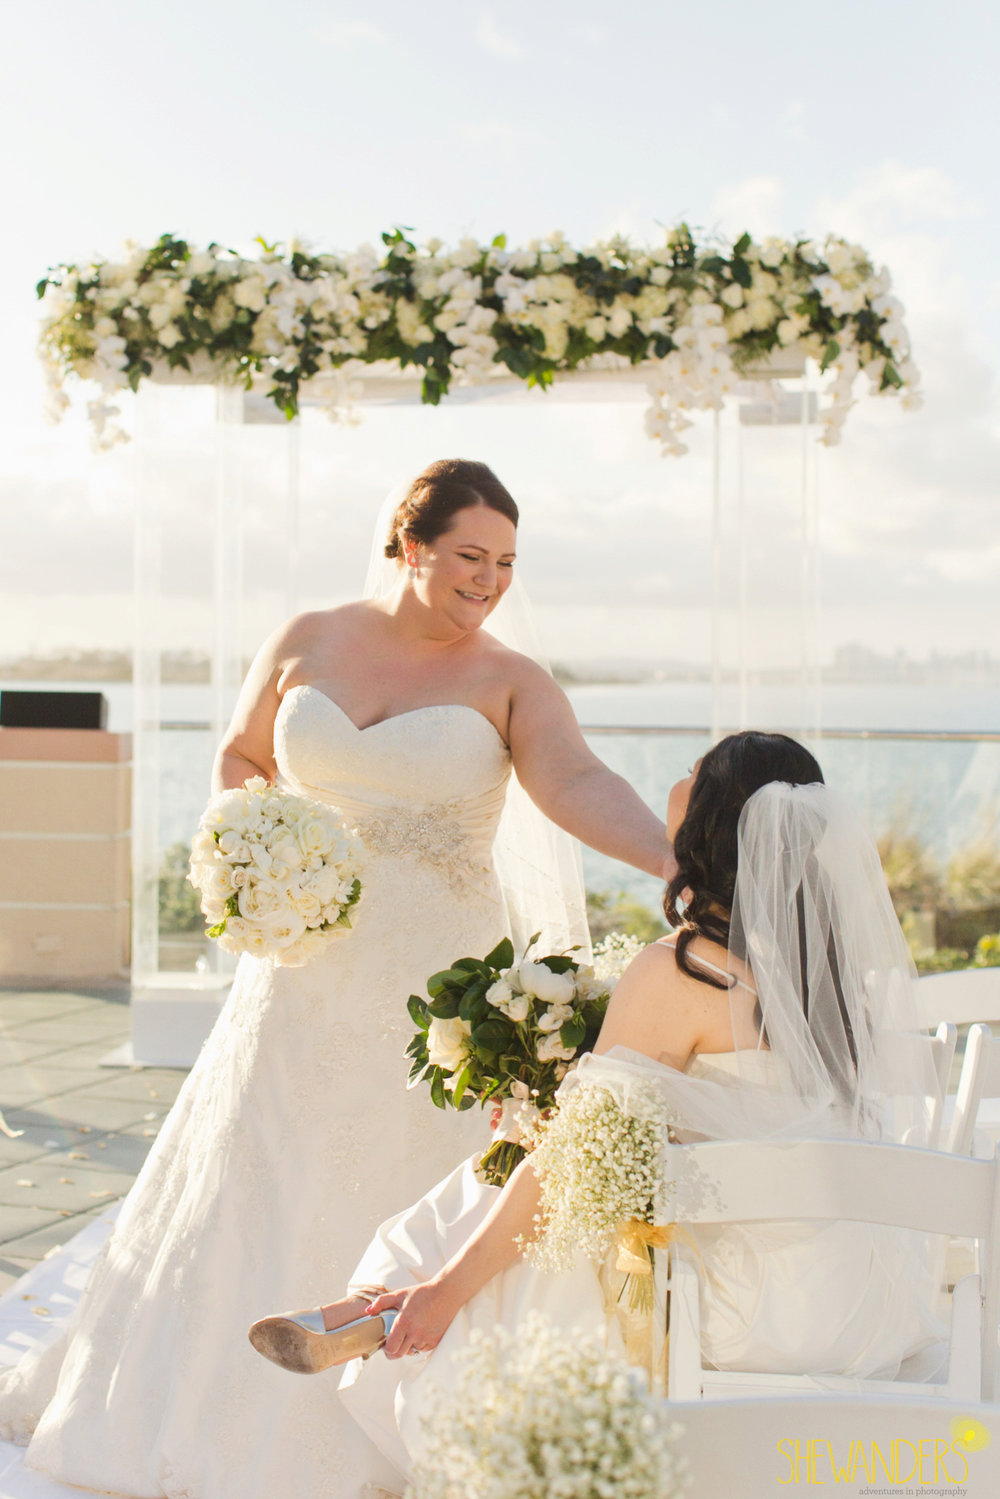 Shewanders.Coronado.Wedding.LaurenJessica-1028.jpg.Wedding.LaurenJessica-1028.jpg